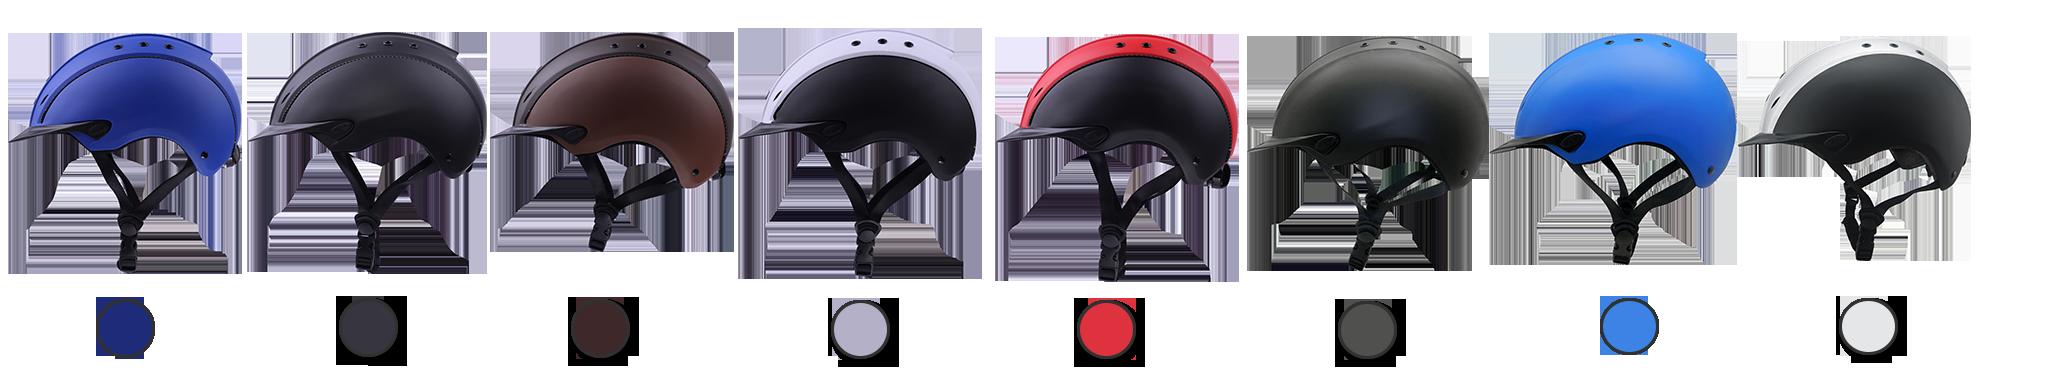 equestrian helmet different color